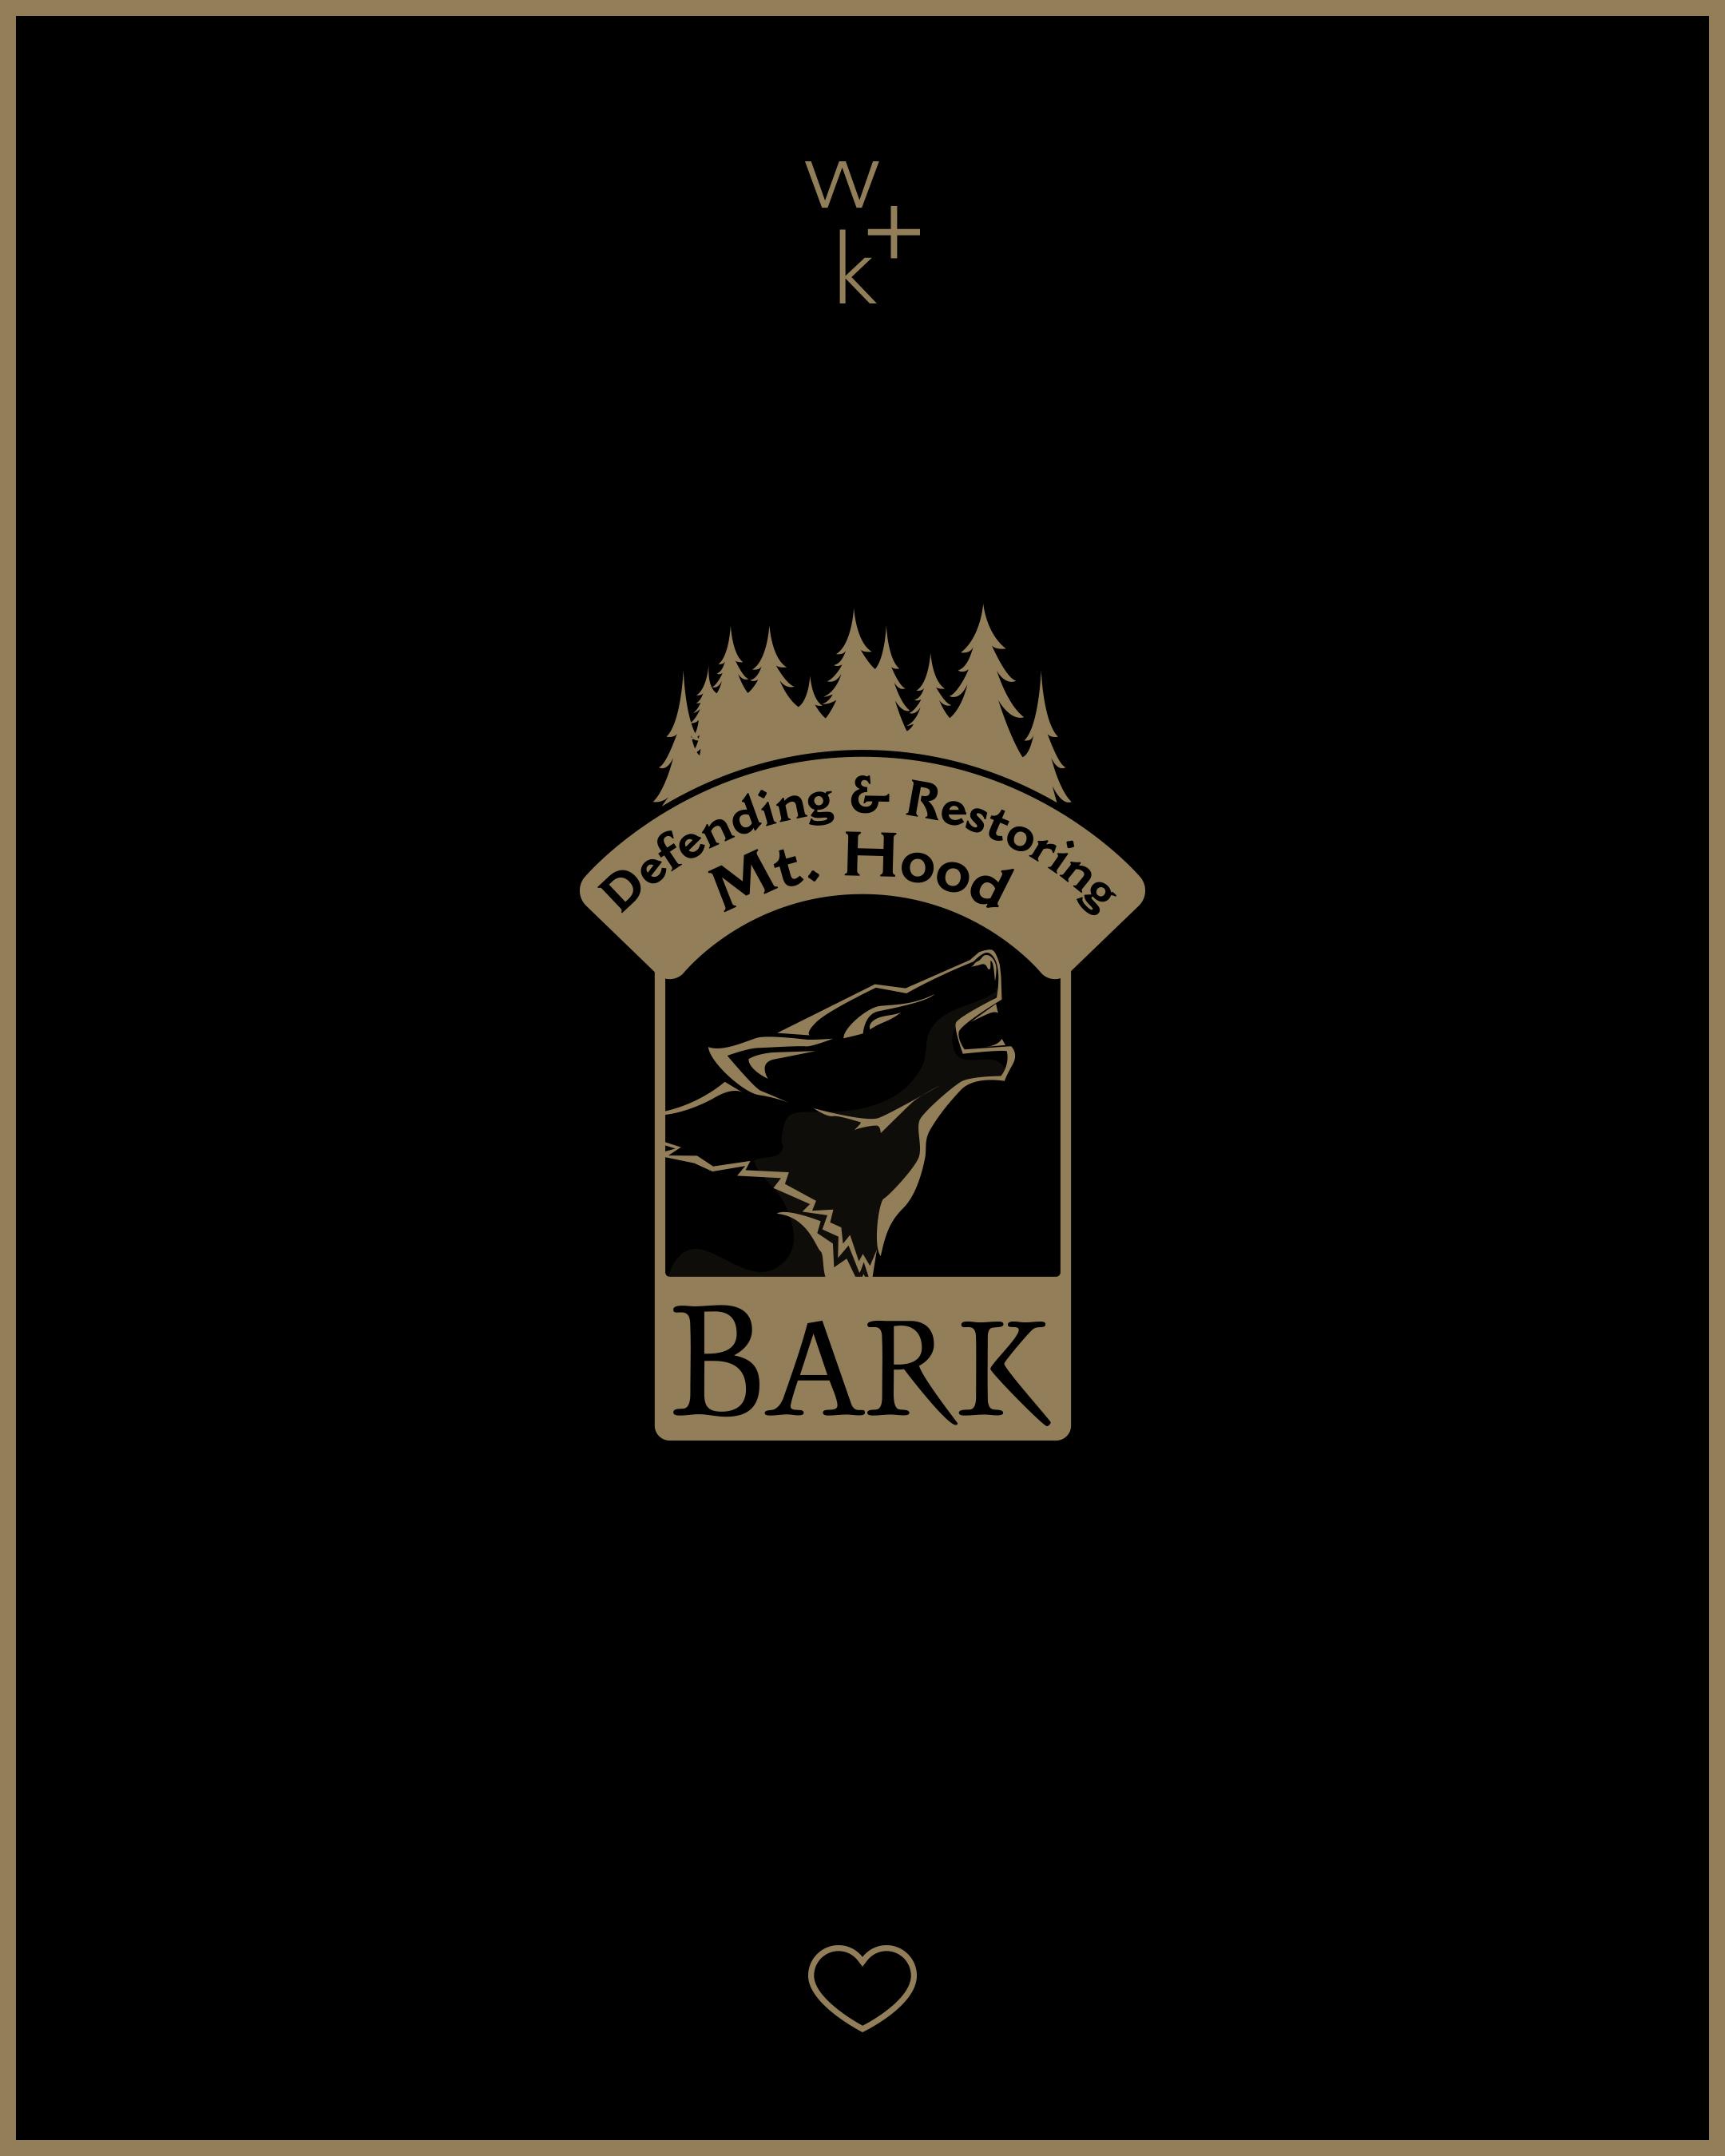 Holiday 2018_Bark_logo.jpg